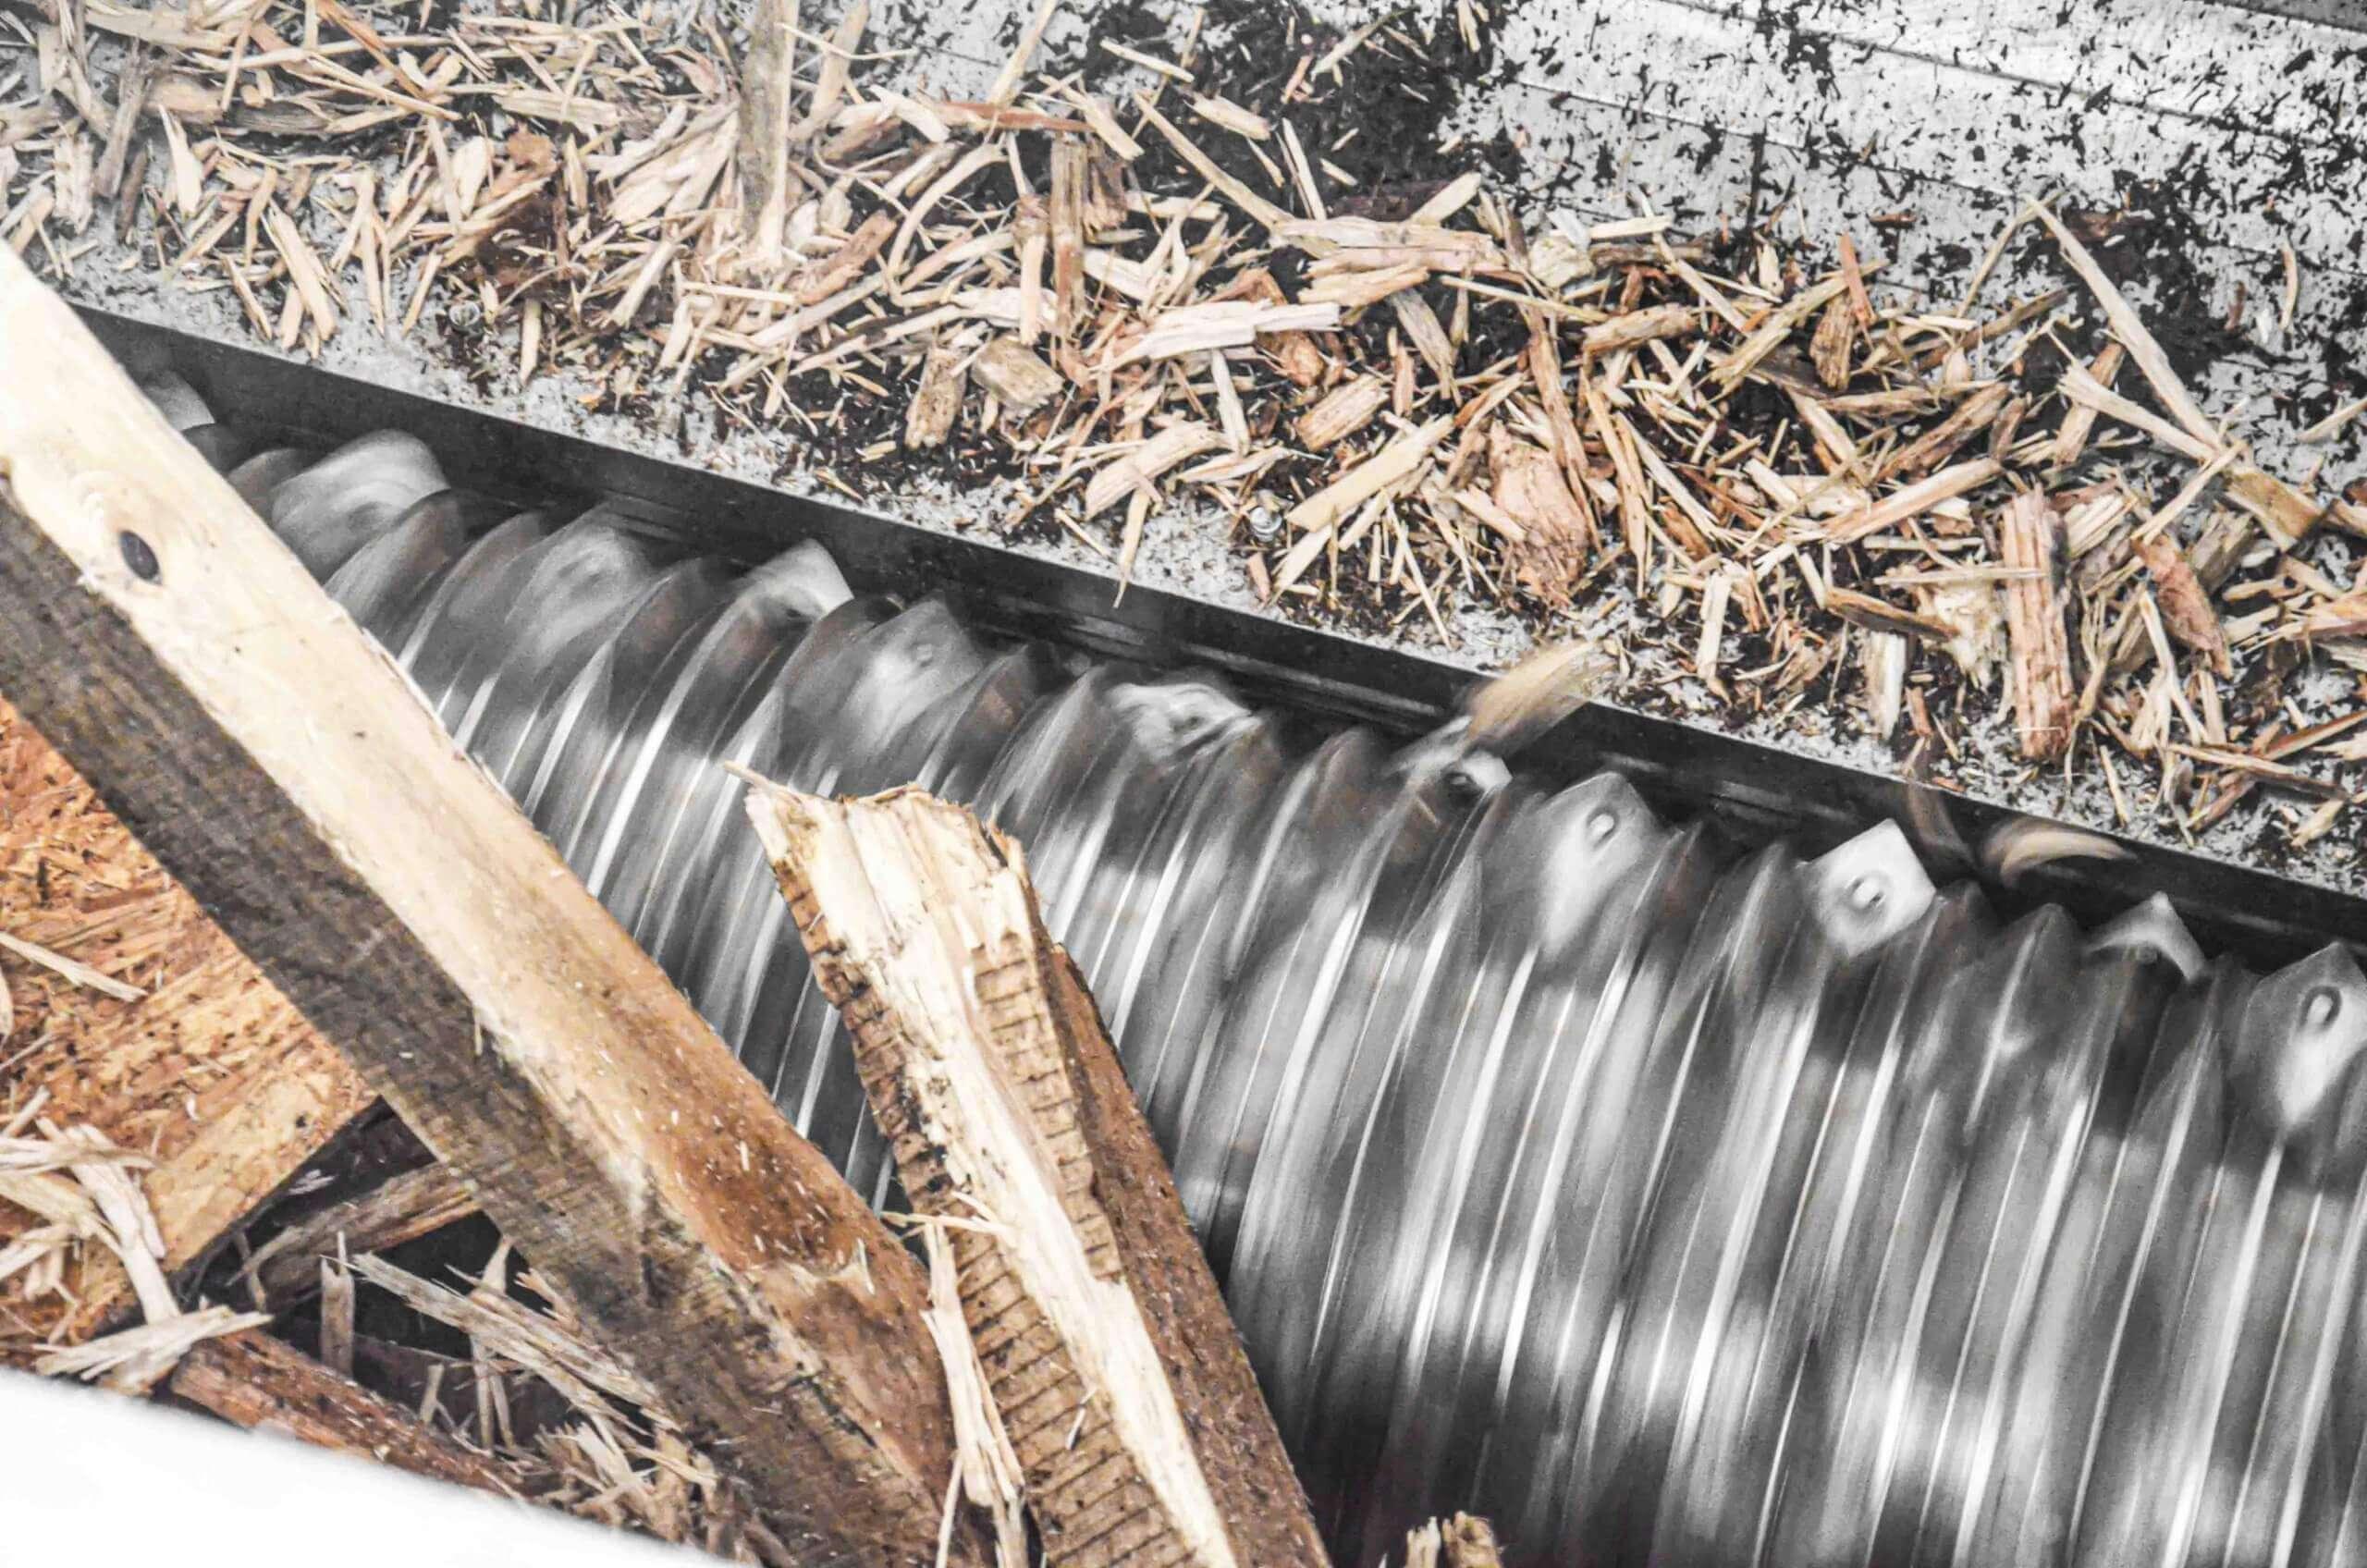 WEIMA rotor during wood shredding